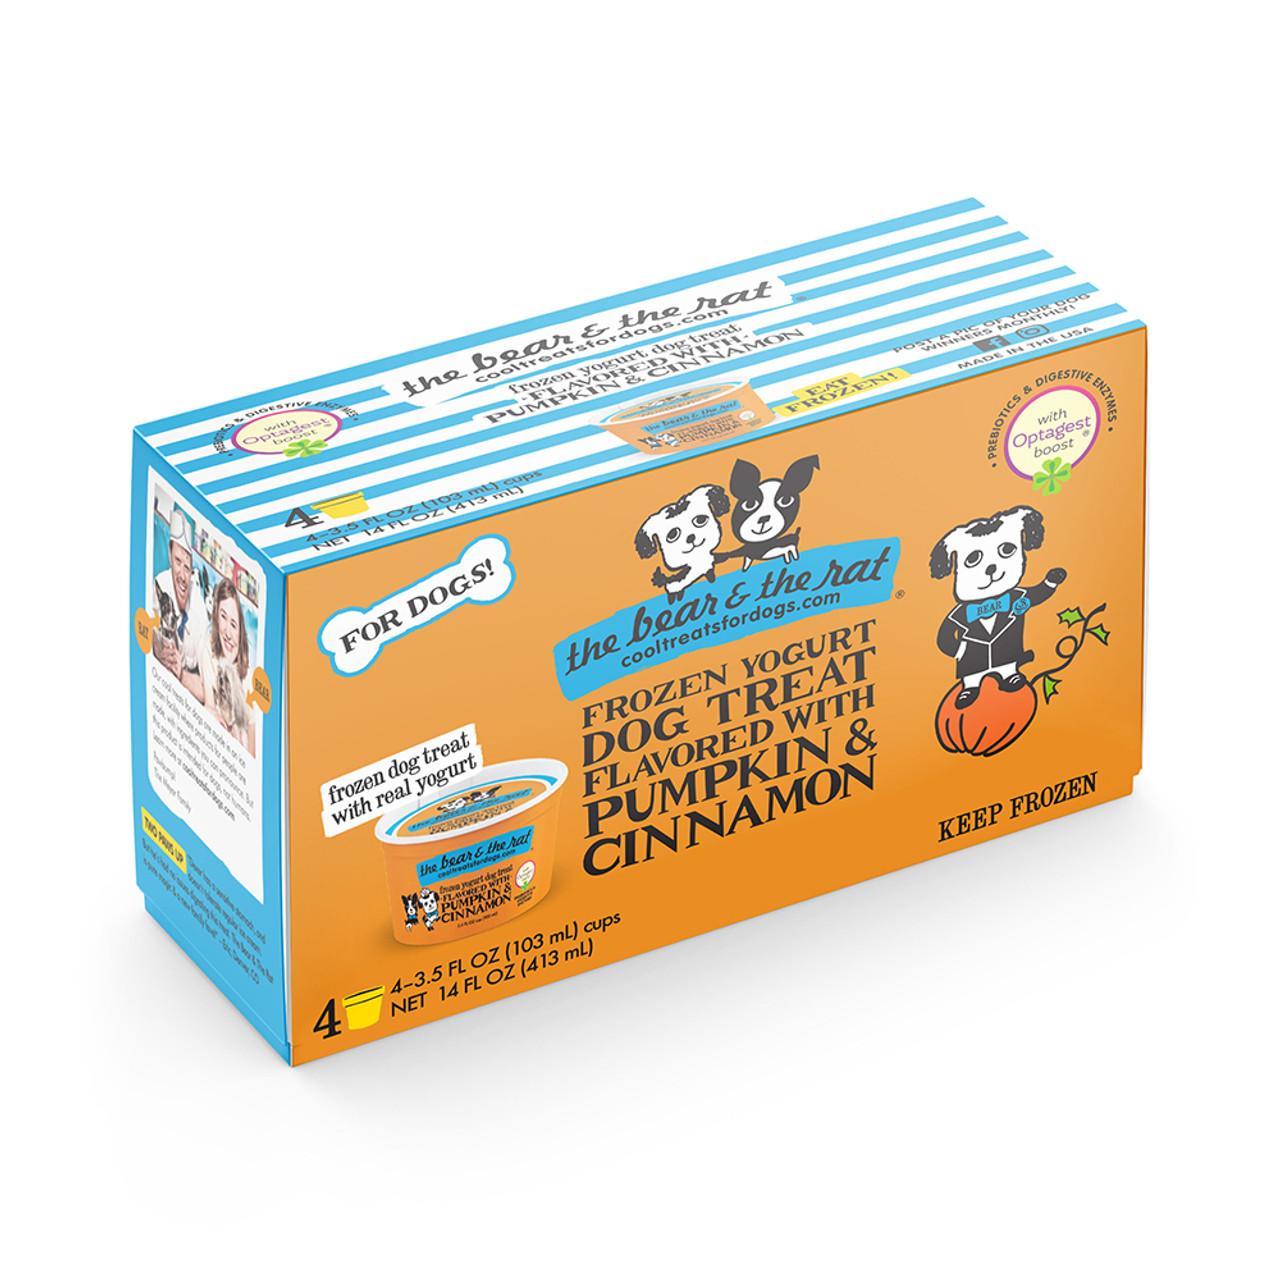 The Bear & The Rat Pumpkin Frozen Yogurt Dog Treat